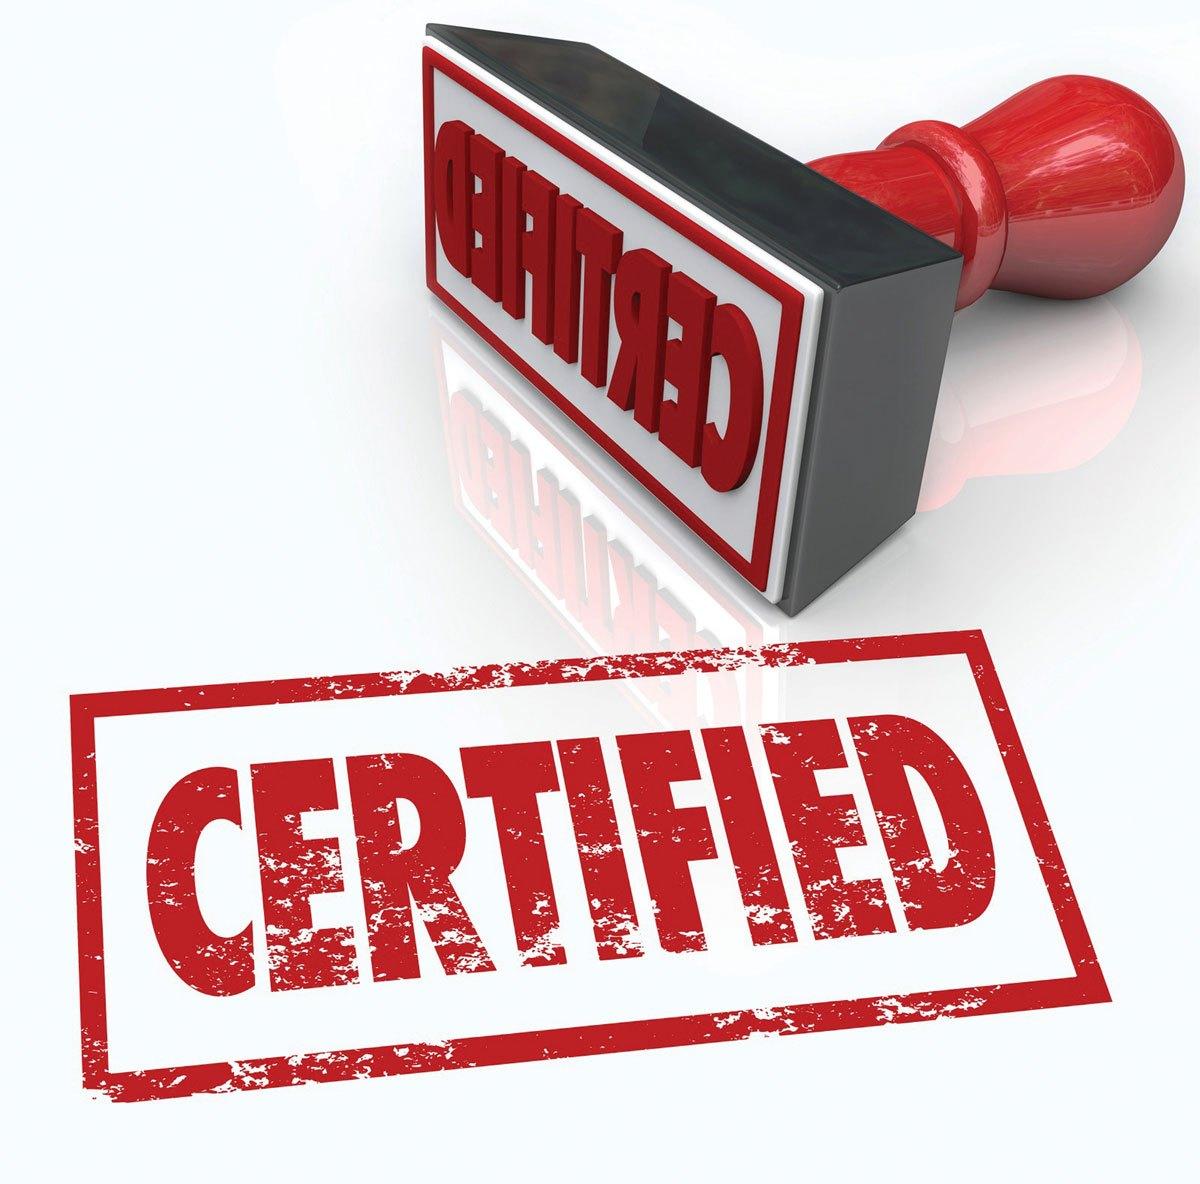 crme revenue management certification hsmai asia pacific region